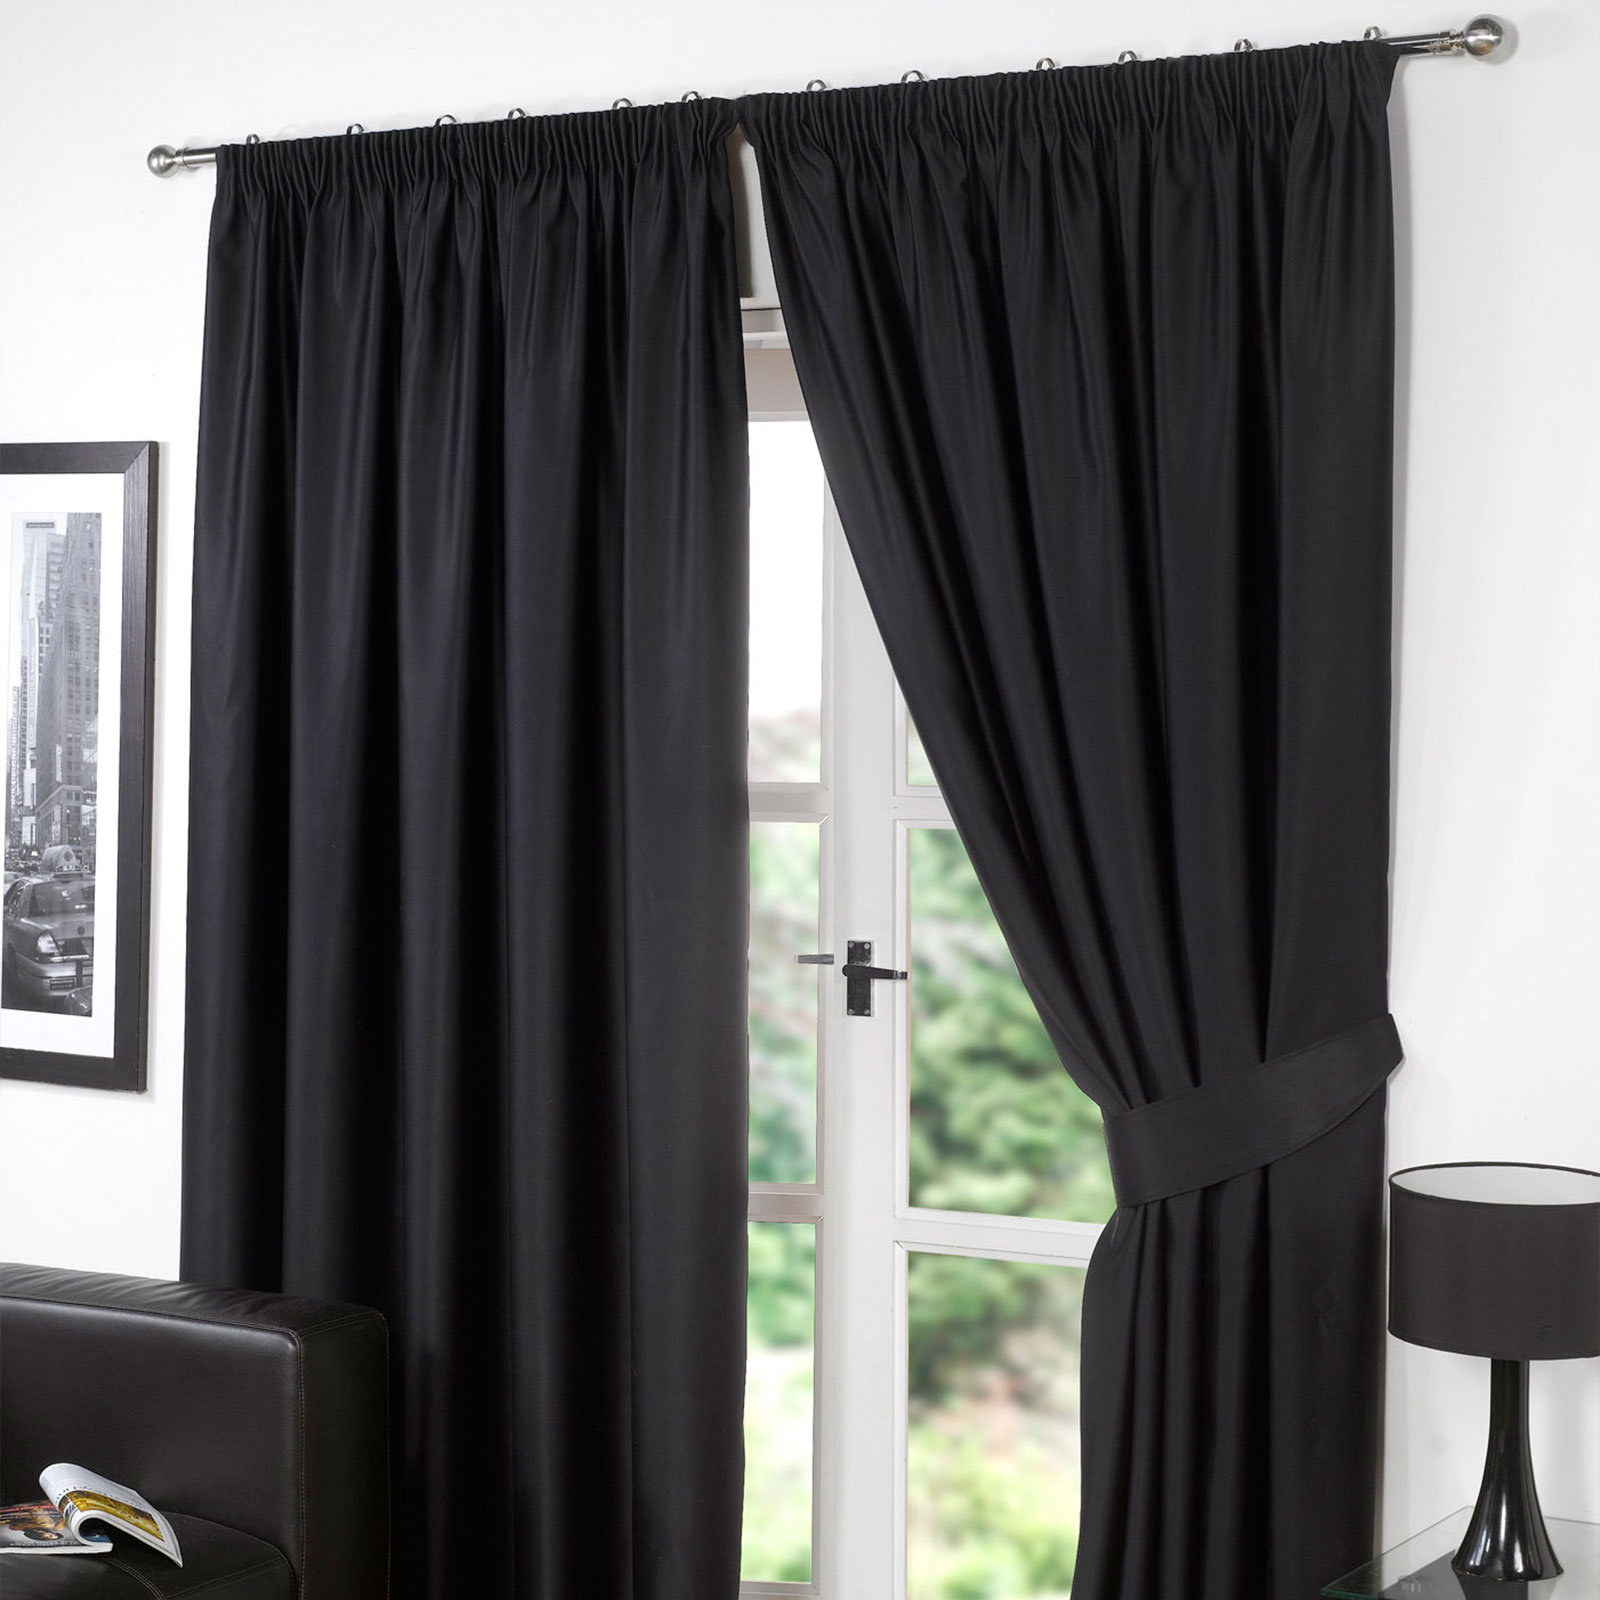 Dreamscene Thermal Pencil Pleat PAIR Of Blackout Curtains